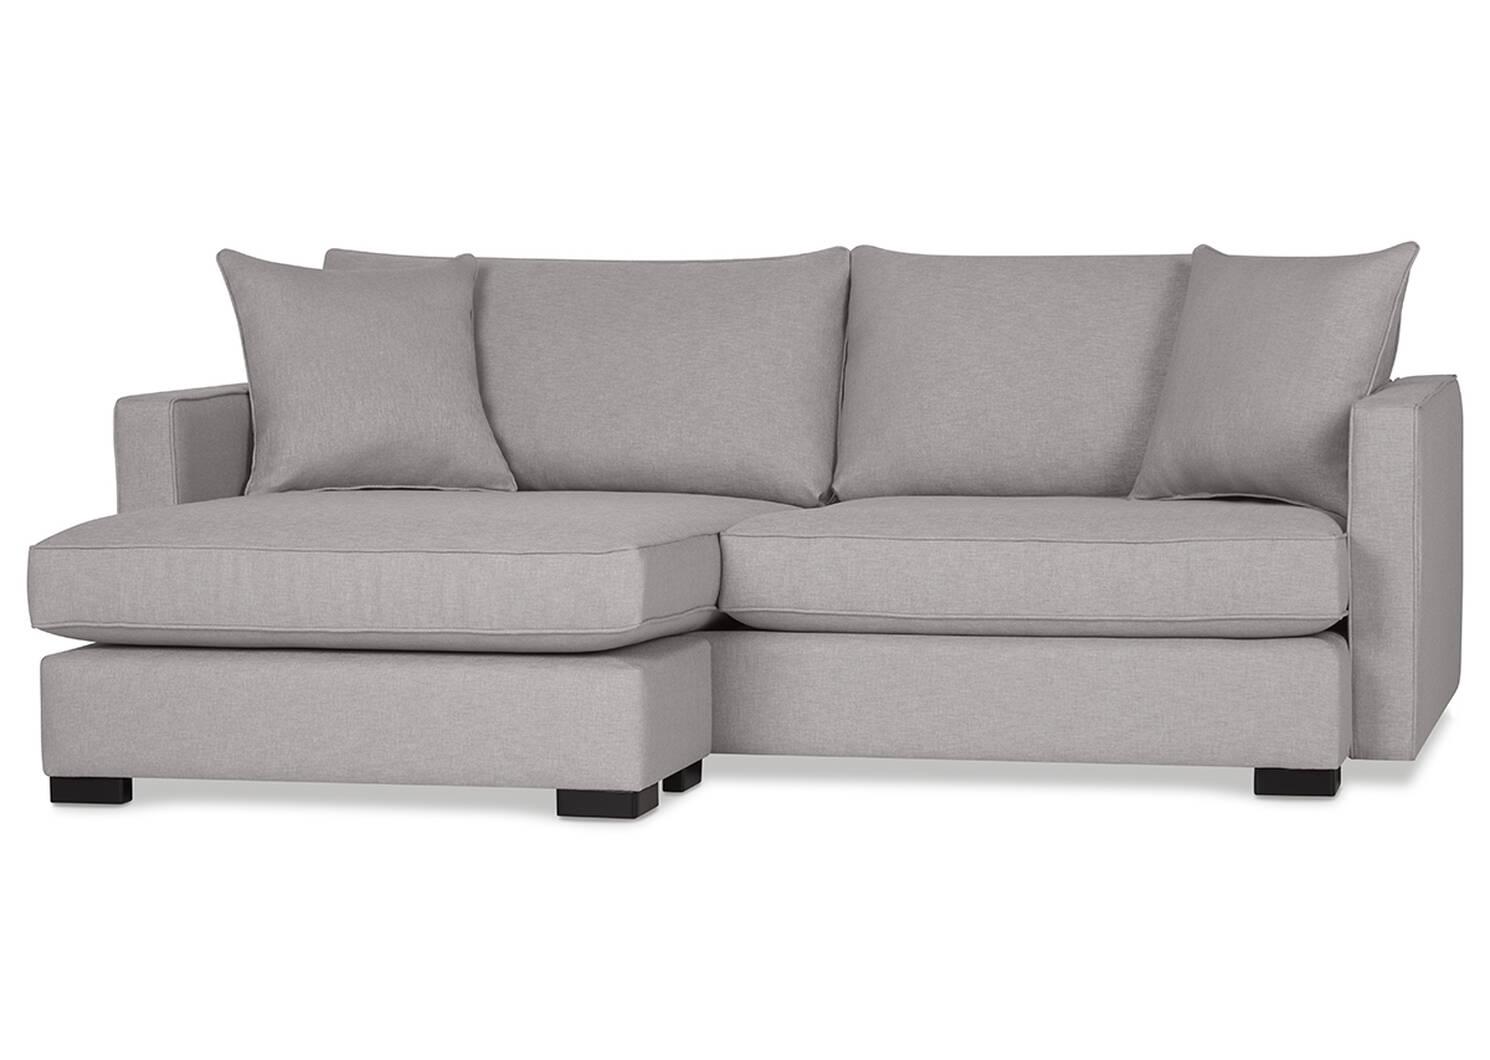 Sibley Custom Sofa Chaise